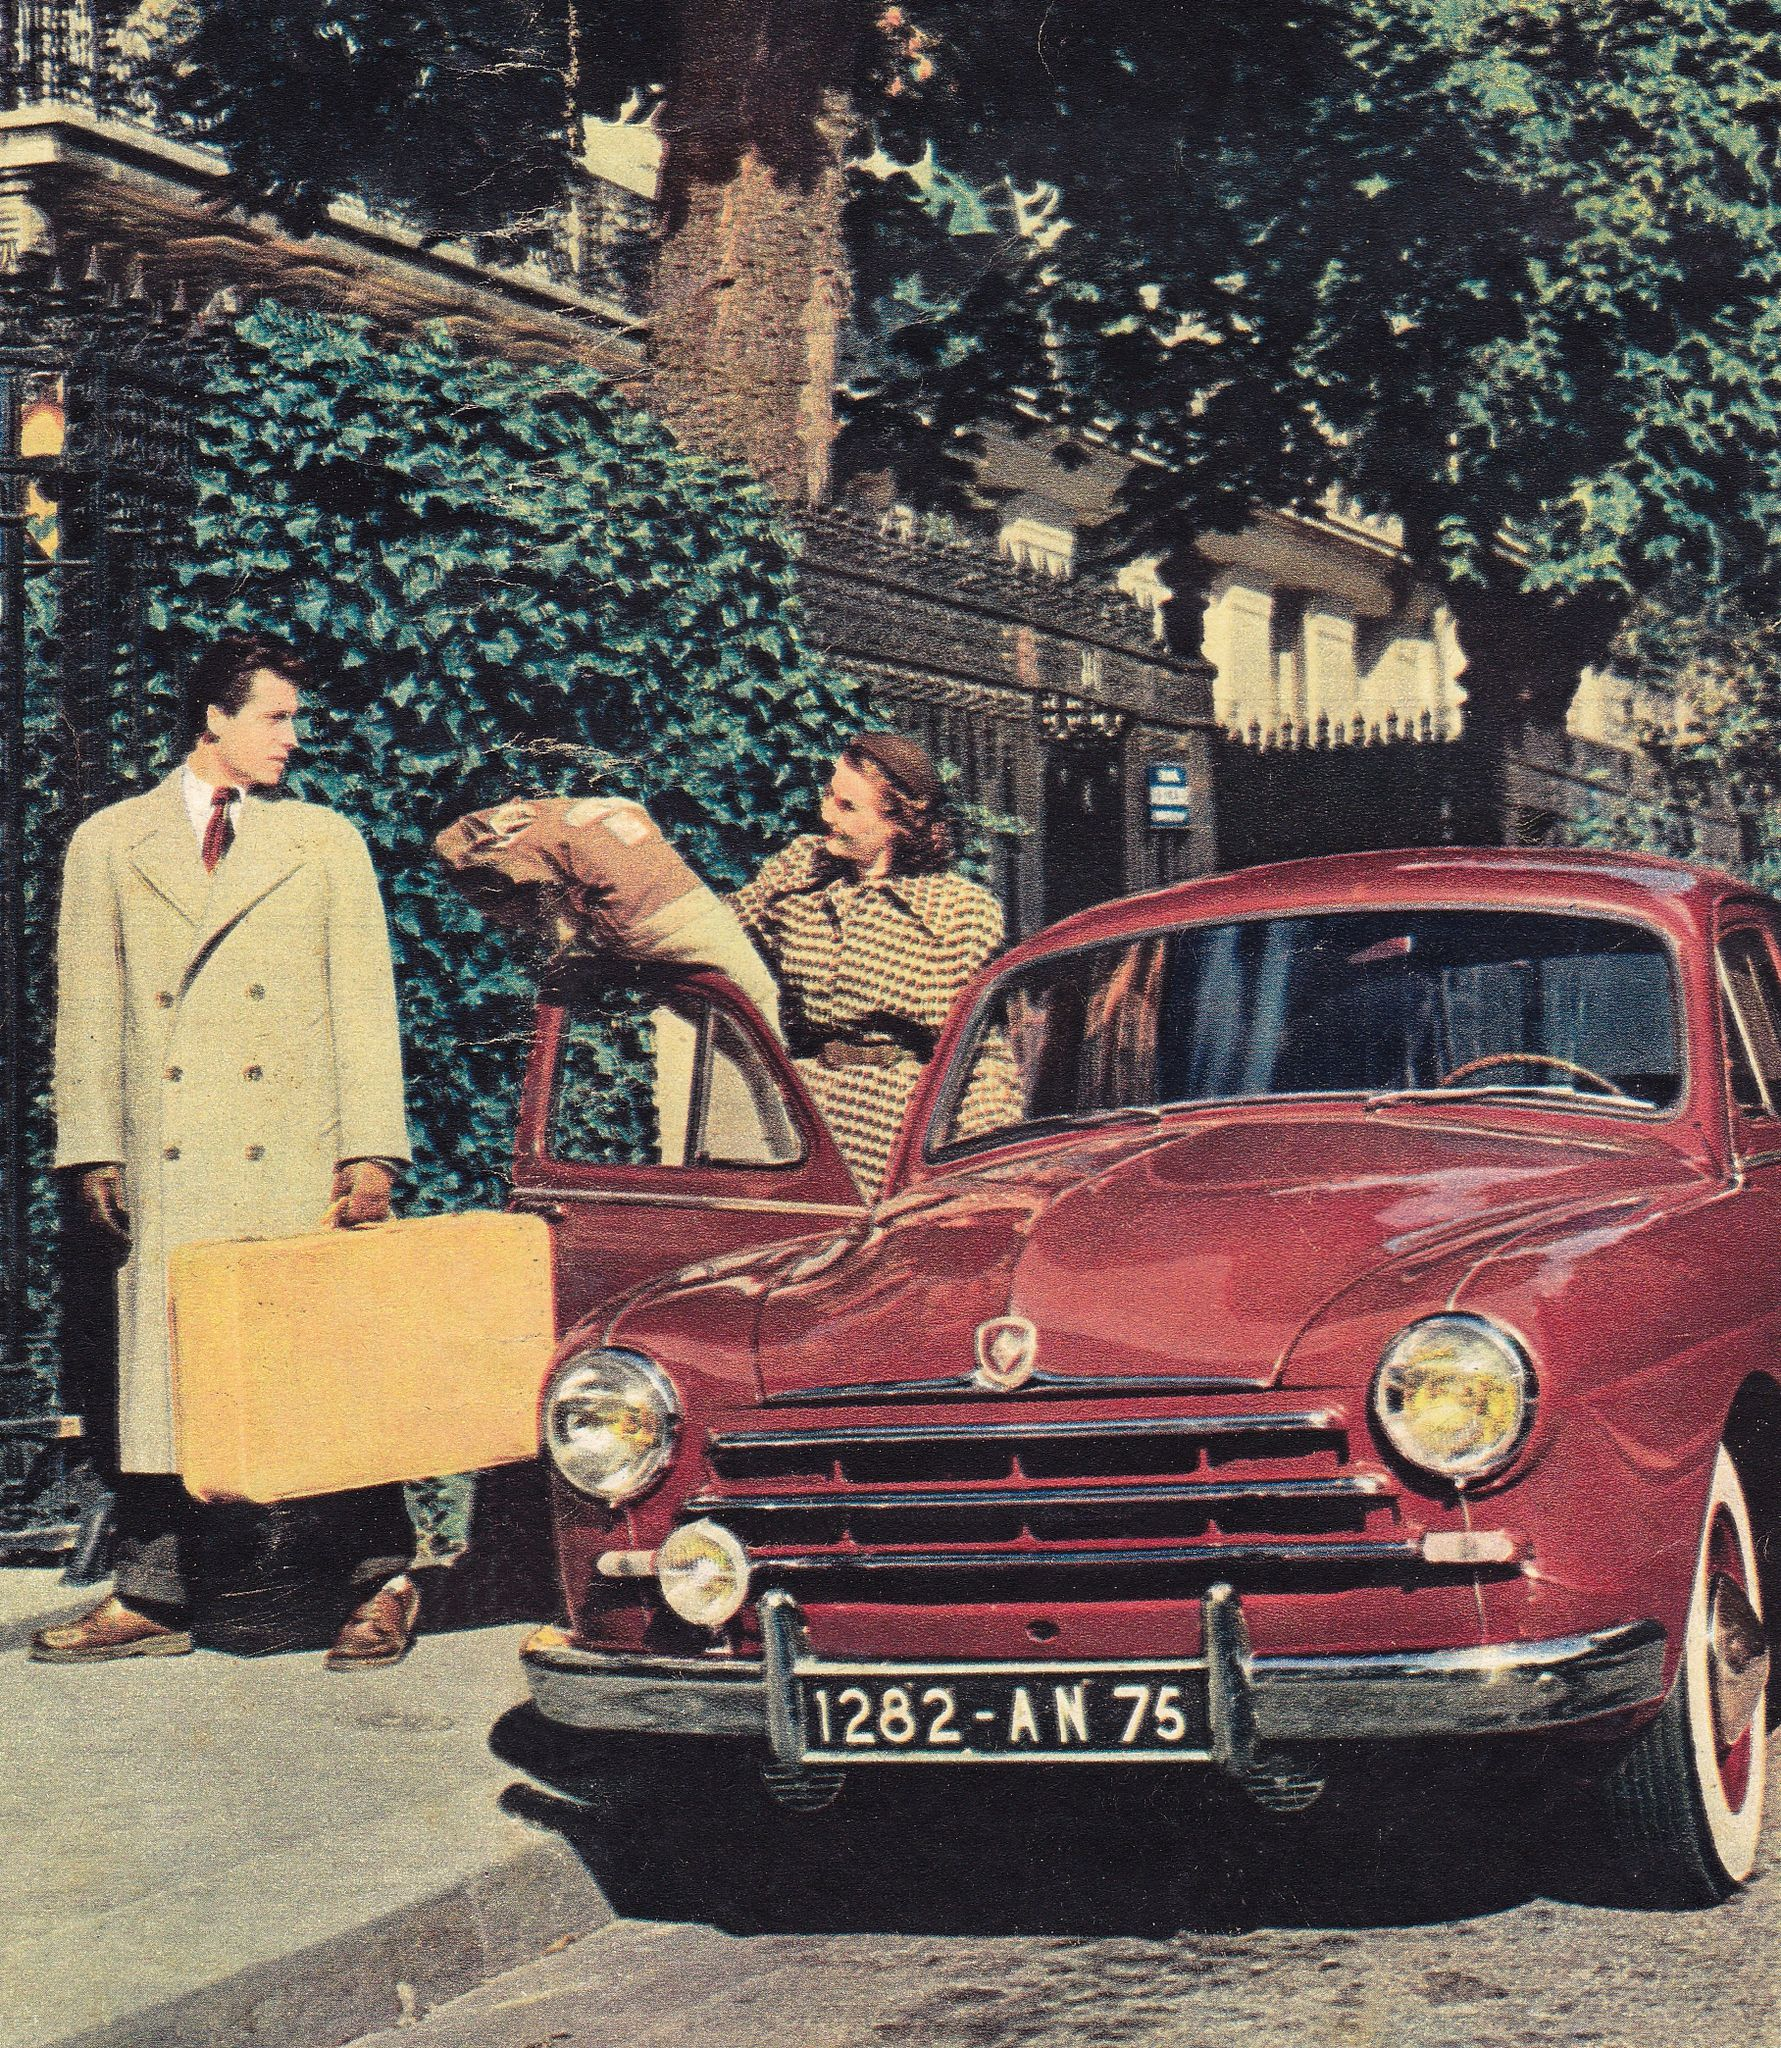 Renault fr gate vintage bikesvintage carsfrenchclassic carshtml